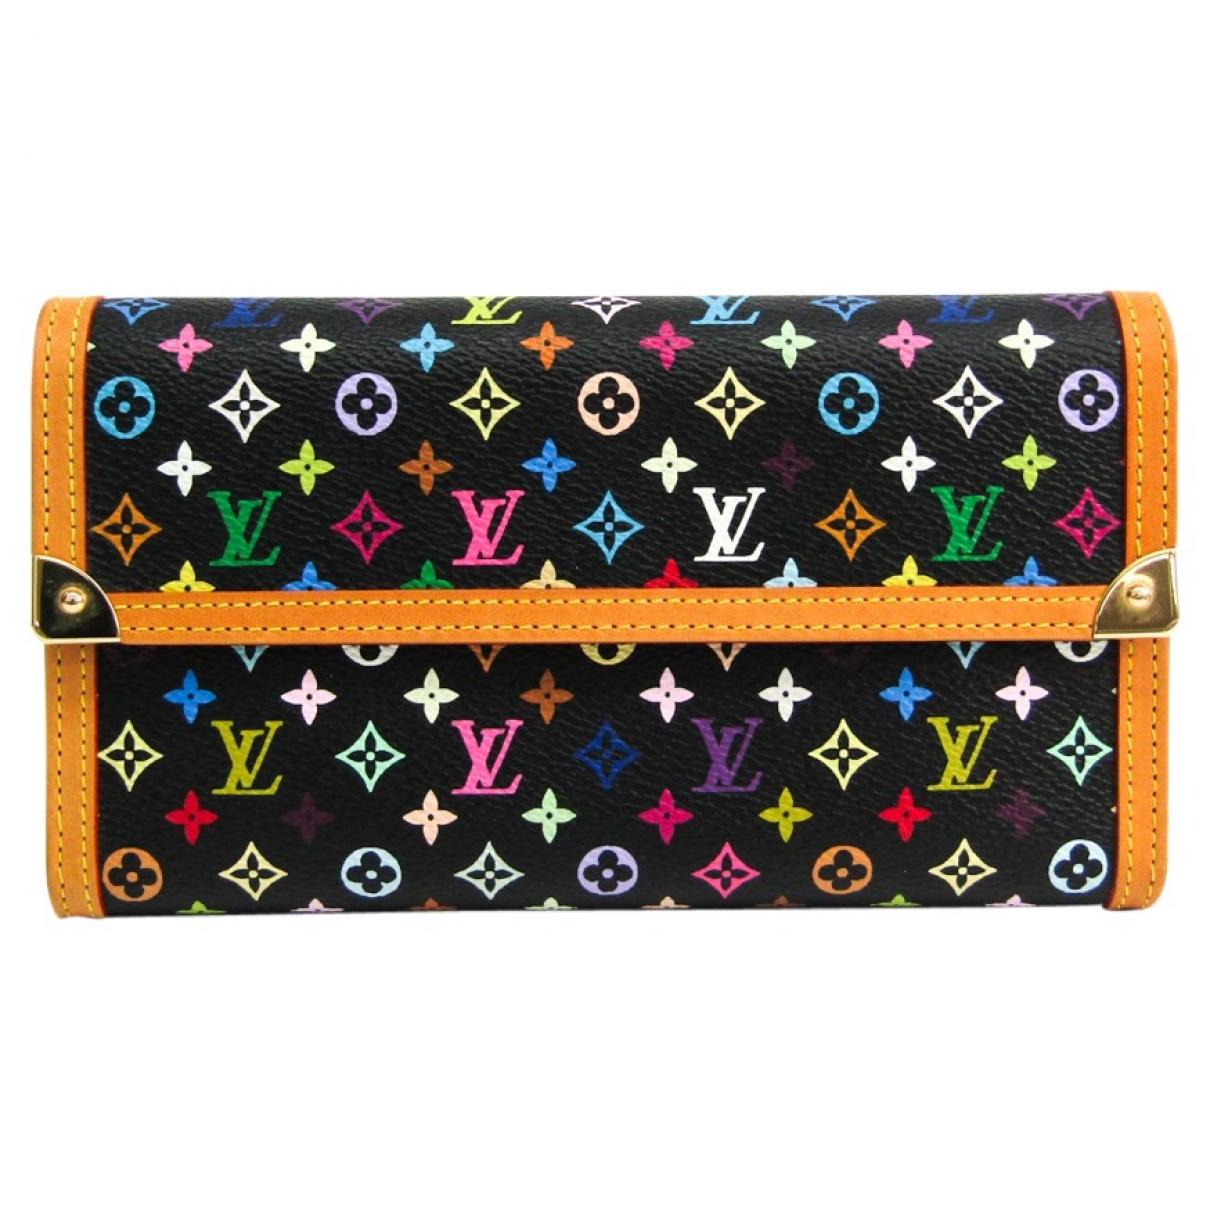 Louis Vuitton \N Black Cloth wallet for Women \N